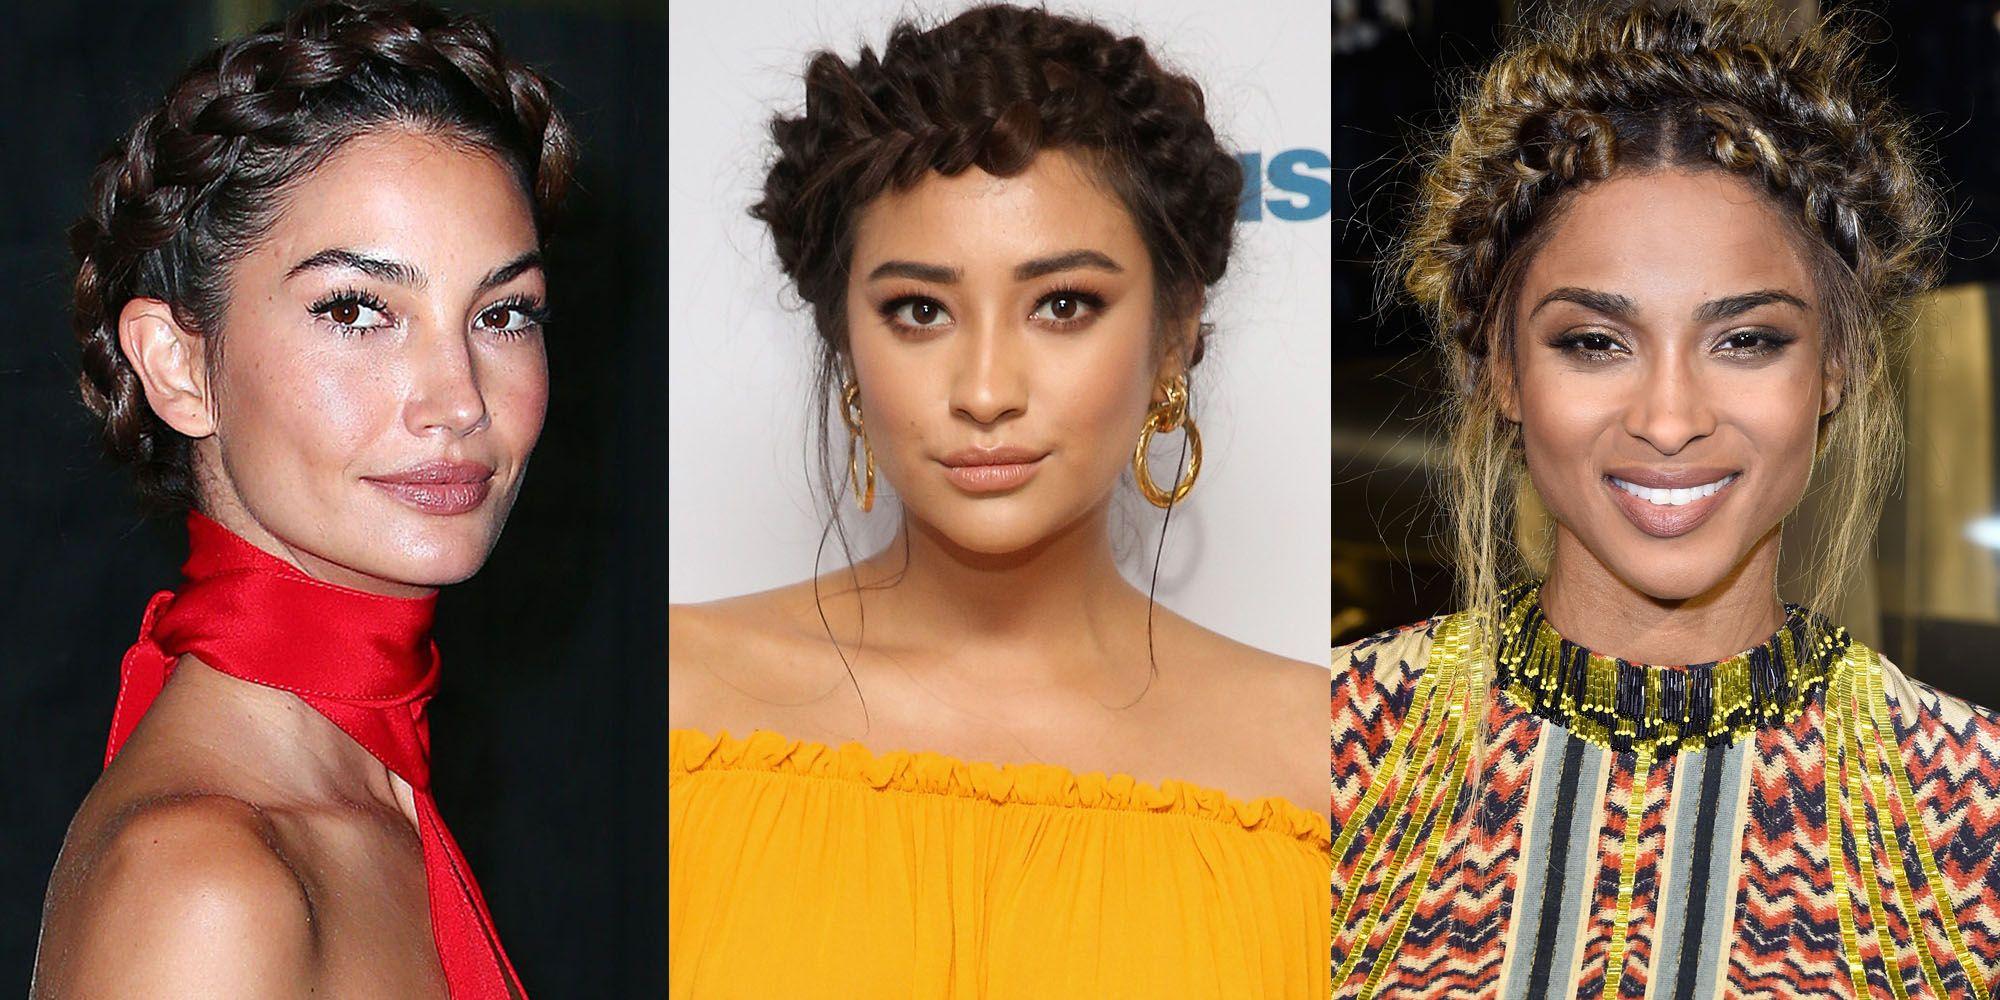 2019 year style- Hair celebrity trend crown braids